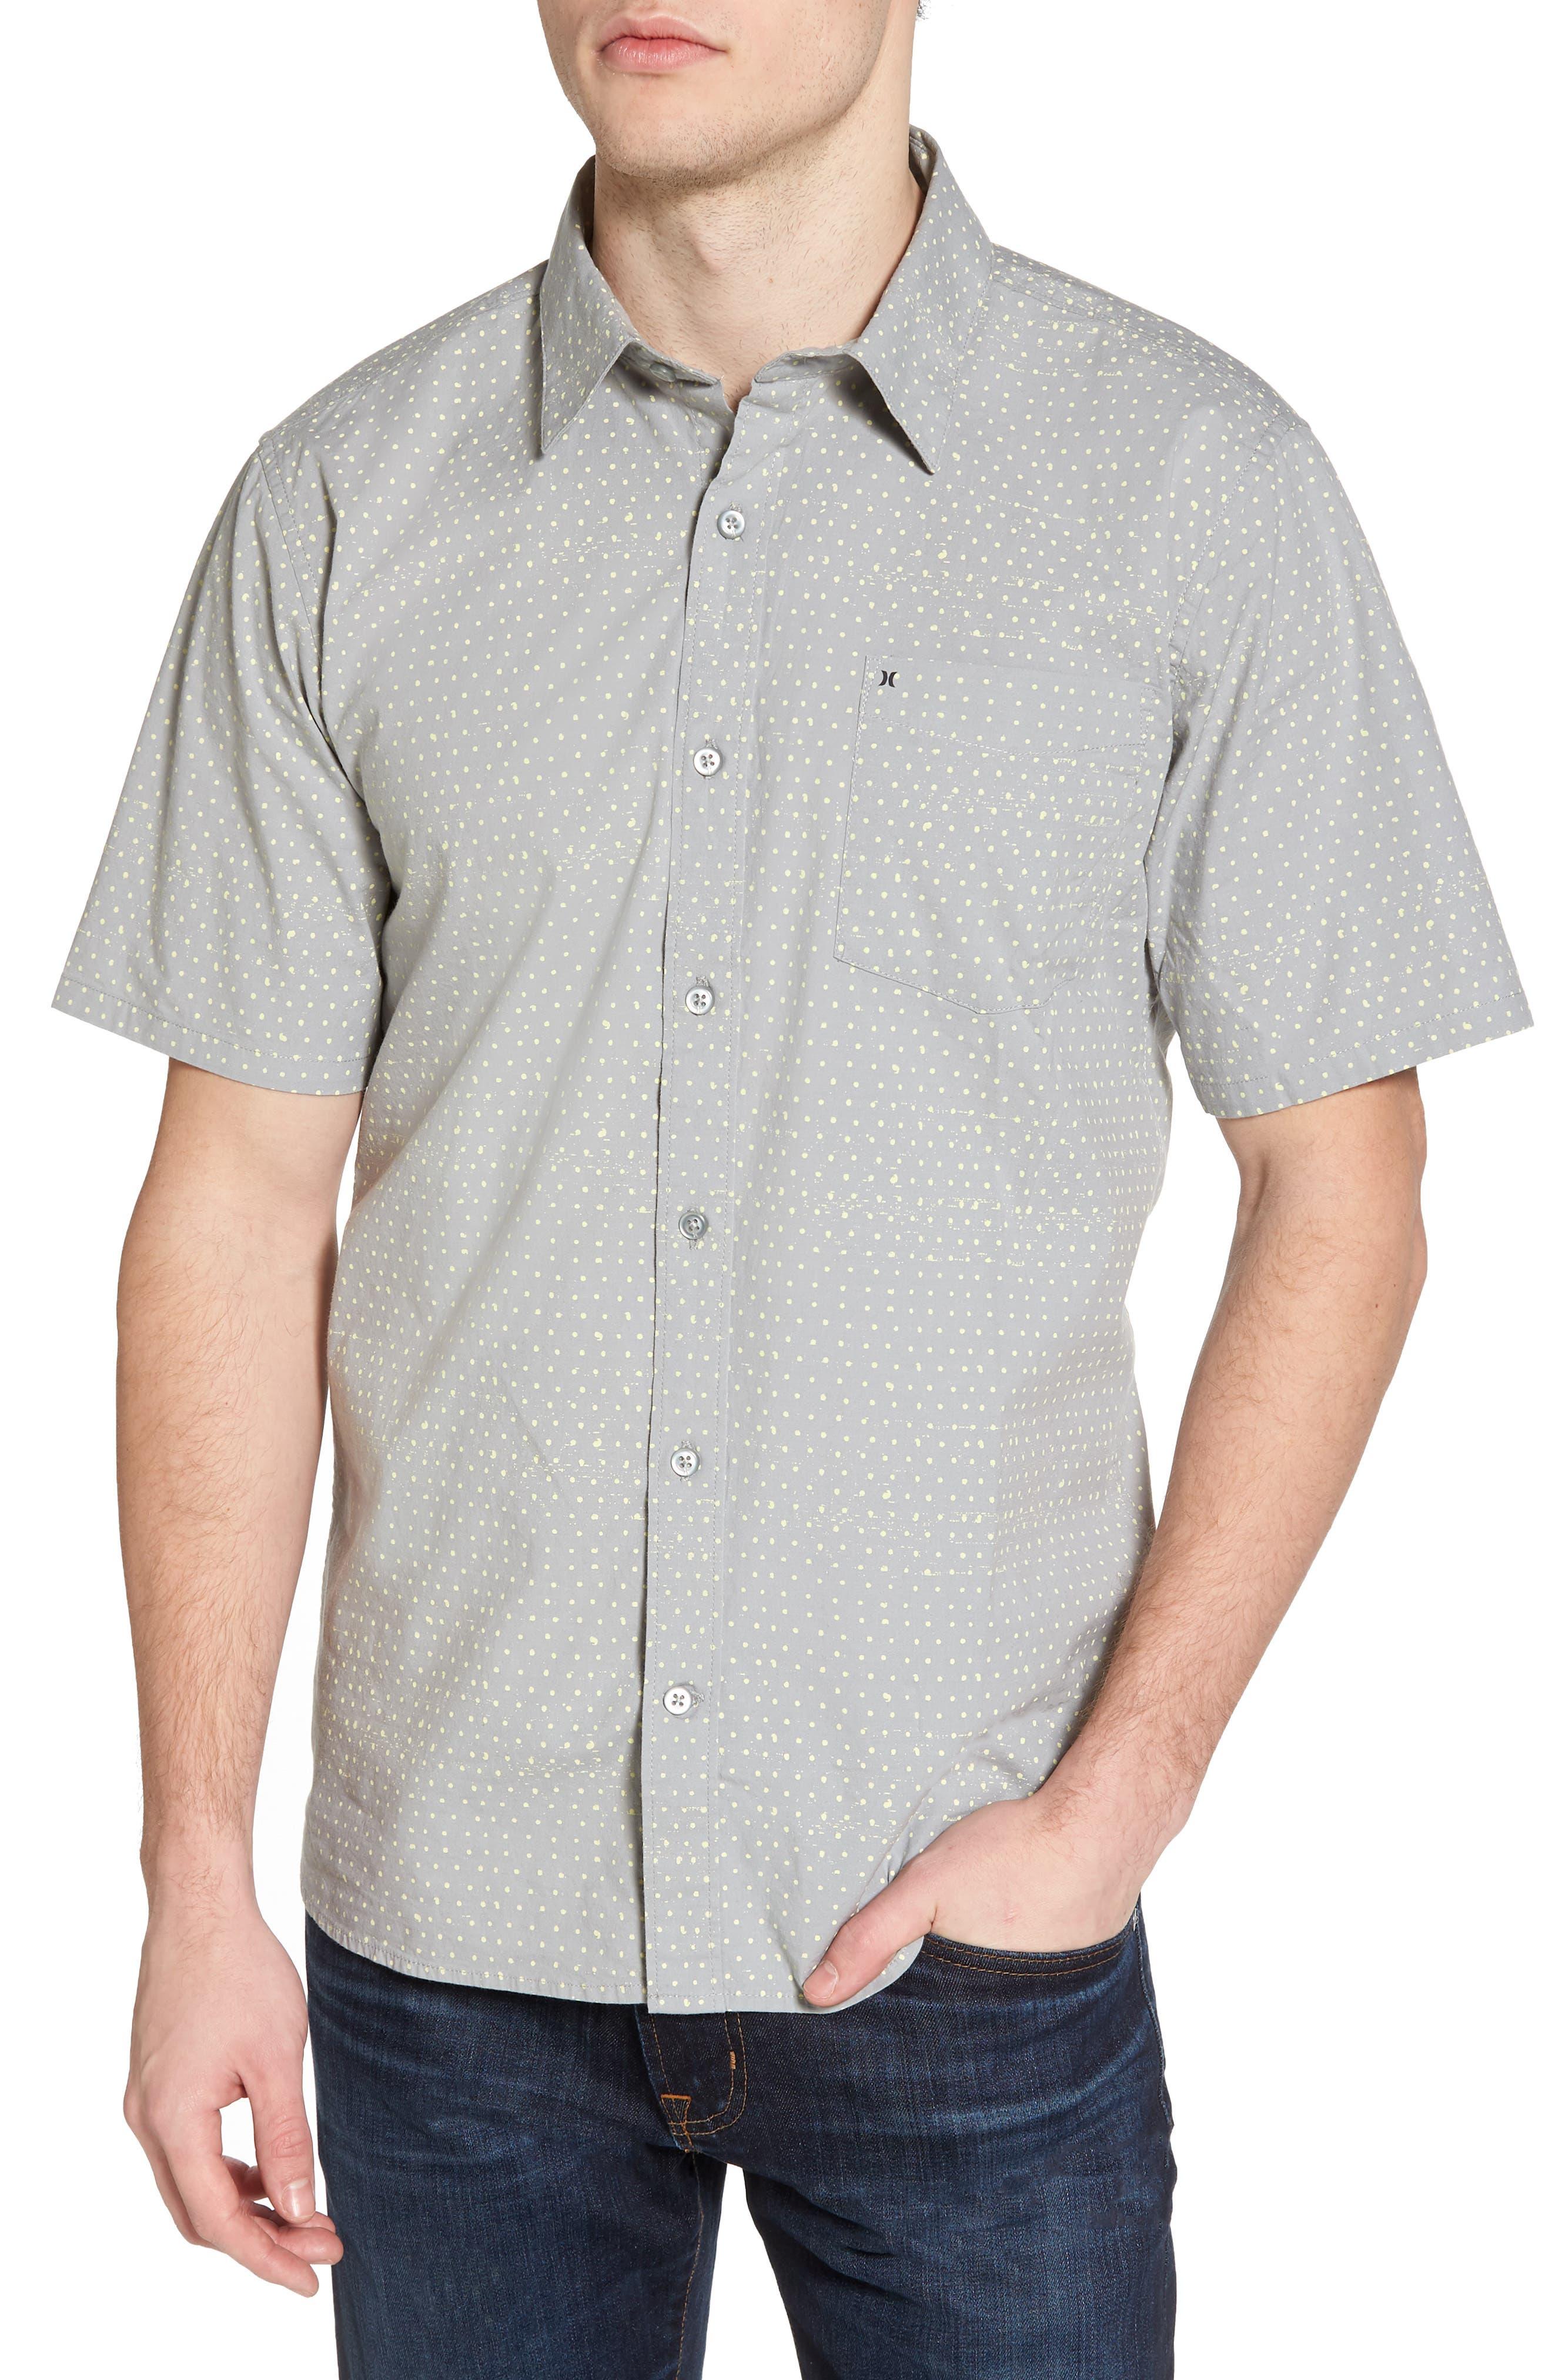 Jones Dot Woven Shirt,                             Main thumbnail 1, color,                             Light Pumice